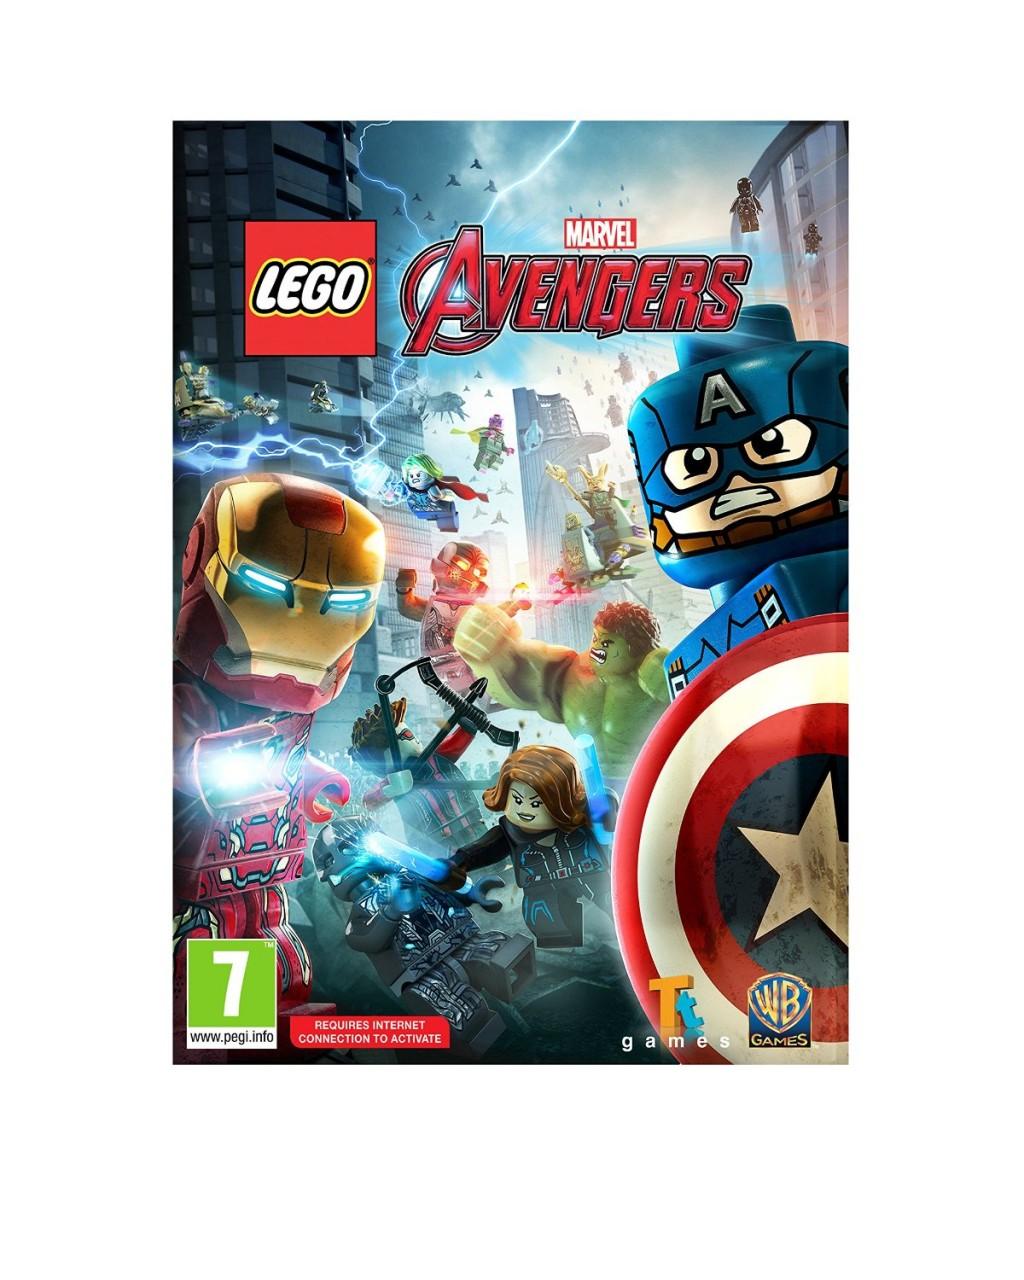 LEGO Marvel Avengers PC DVD computer game - eveikals.lv